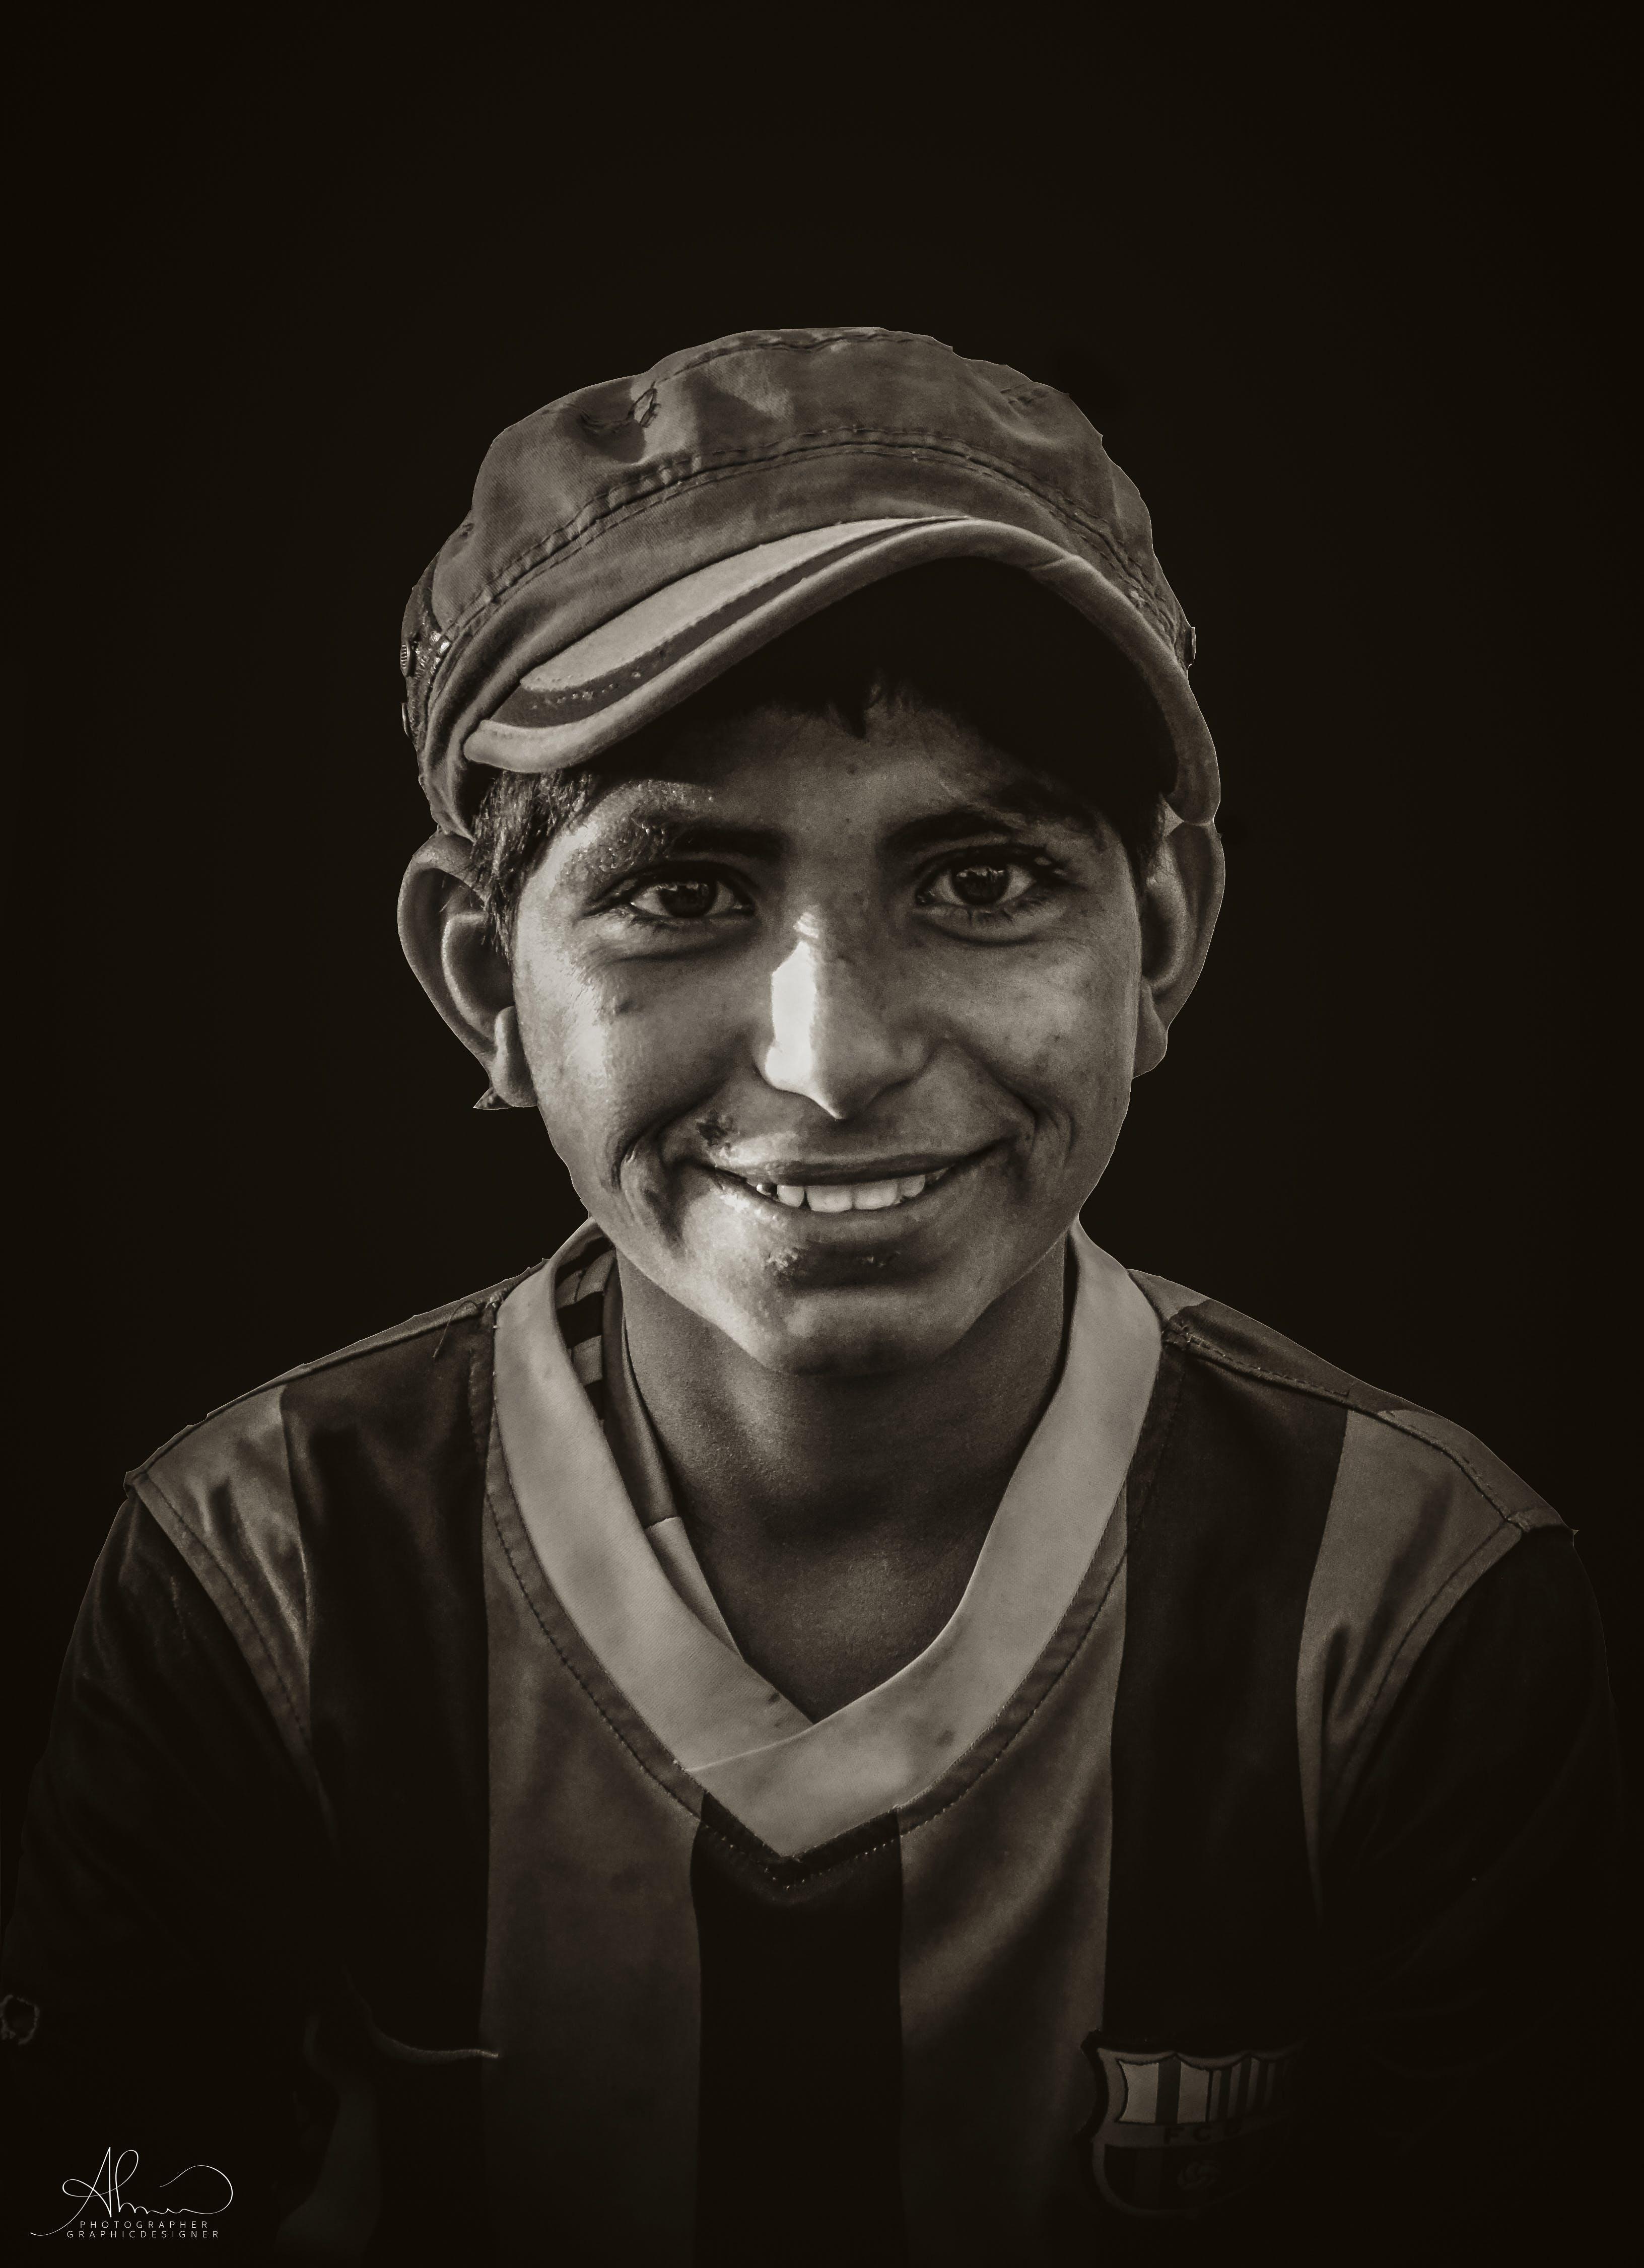 Free stock photo of arabic, black and white, black background, boy